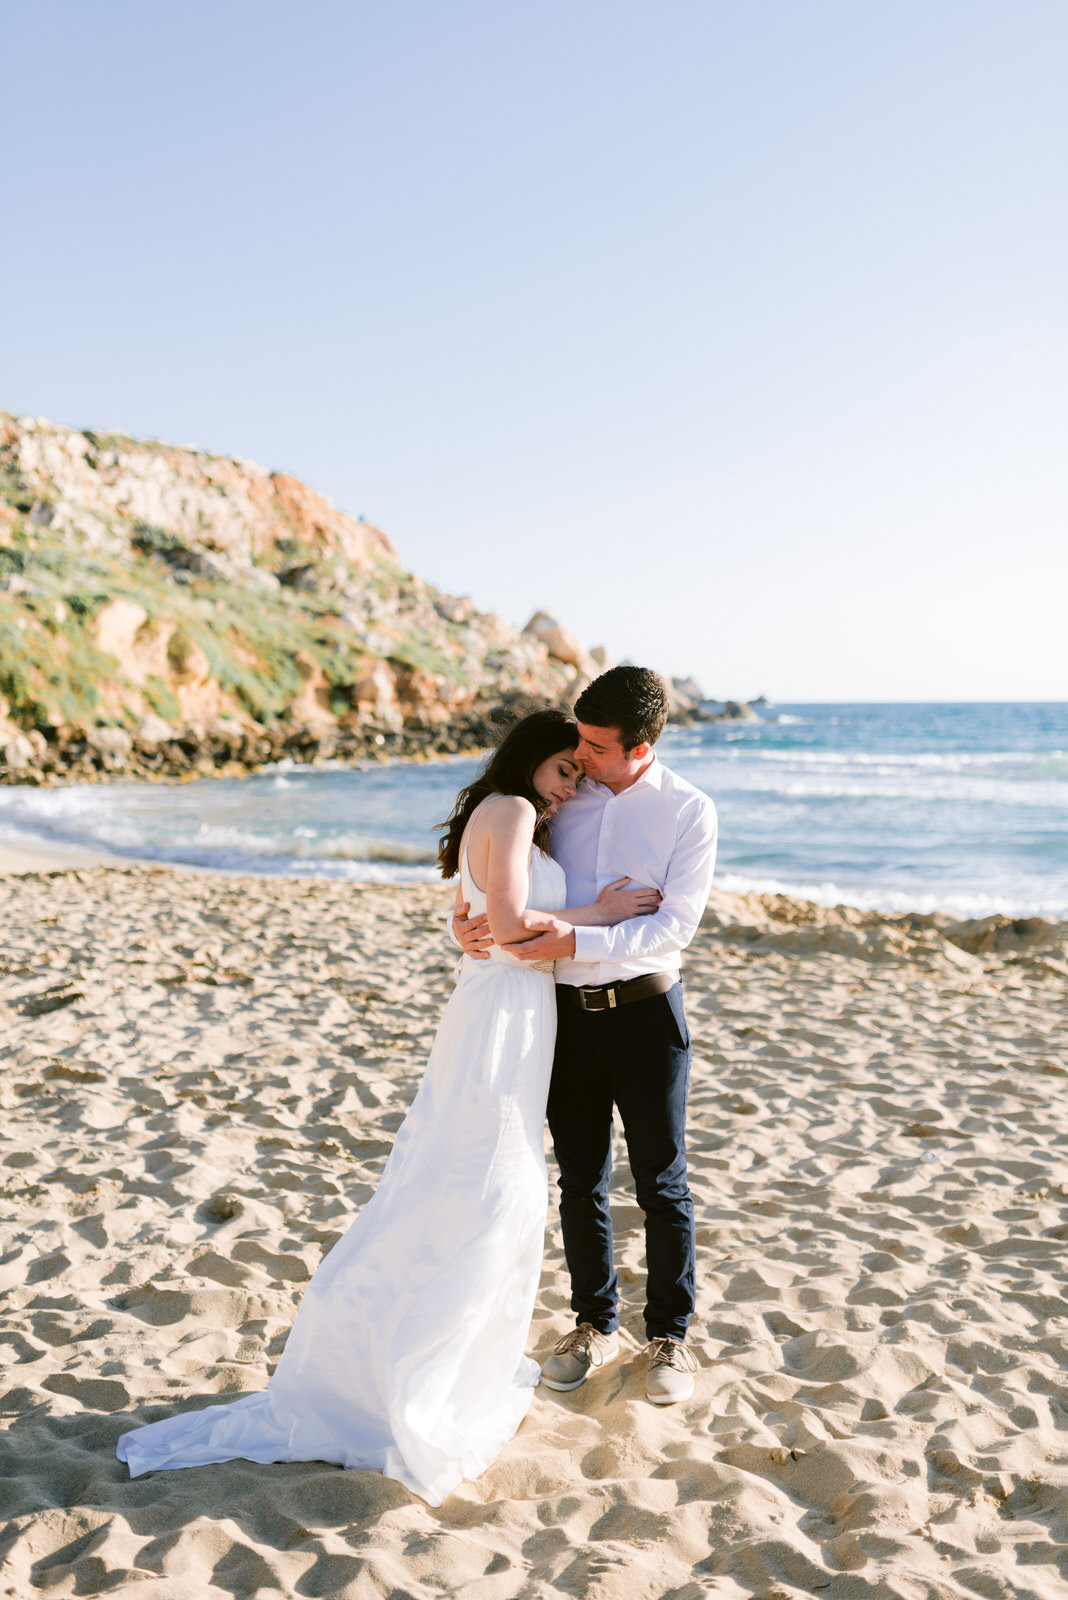 mdina wedding, malta wedding photography, malta elopement, golden bay malta wedding photos, wedding photographer malta, malta wedding venue, villa bologna wedding (88).jpg